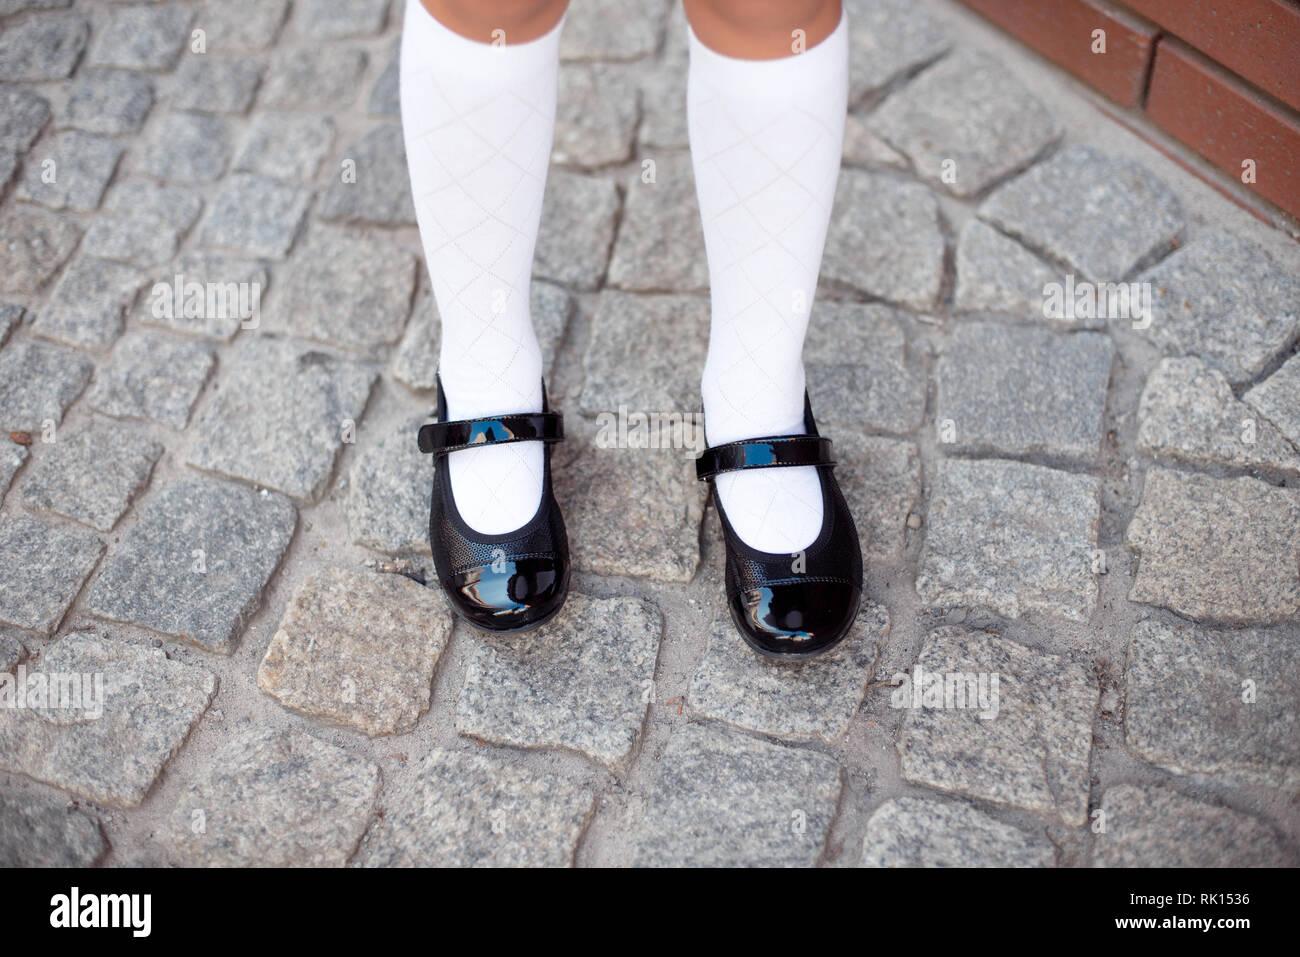 f91d713df4f8 Close-up retro style image of school girl s feet in uniform. - Stock Image